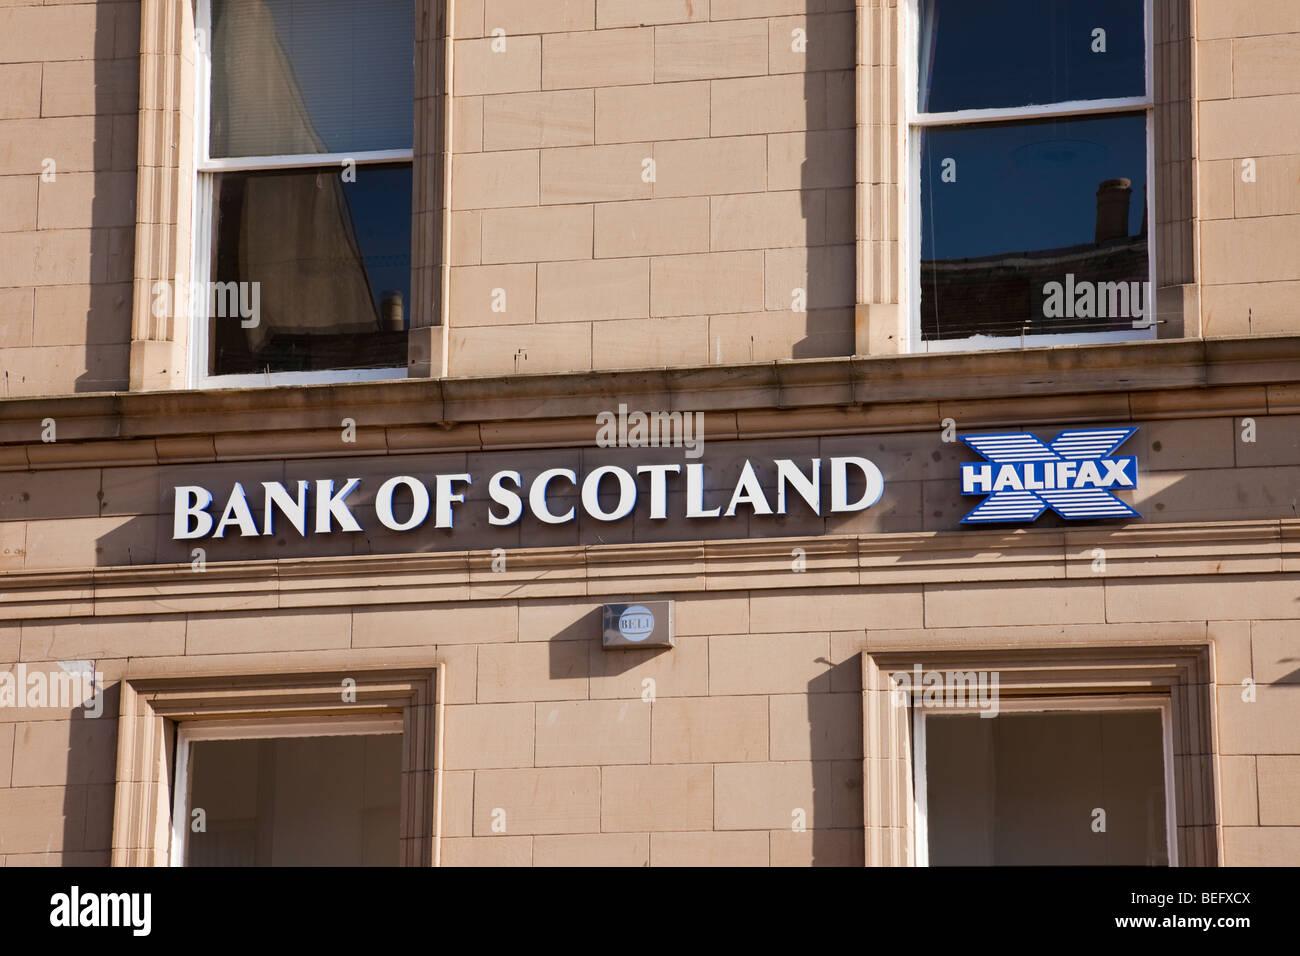 Bank of Scotland and Halifax building society signs. England, UK - Stock Image